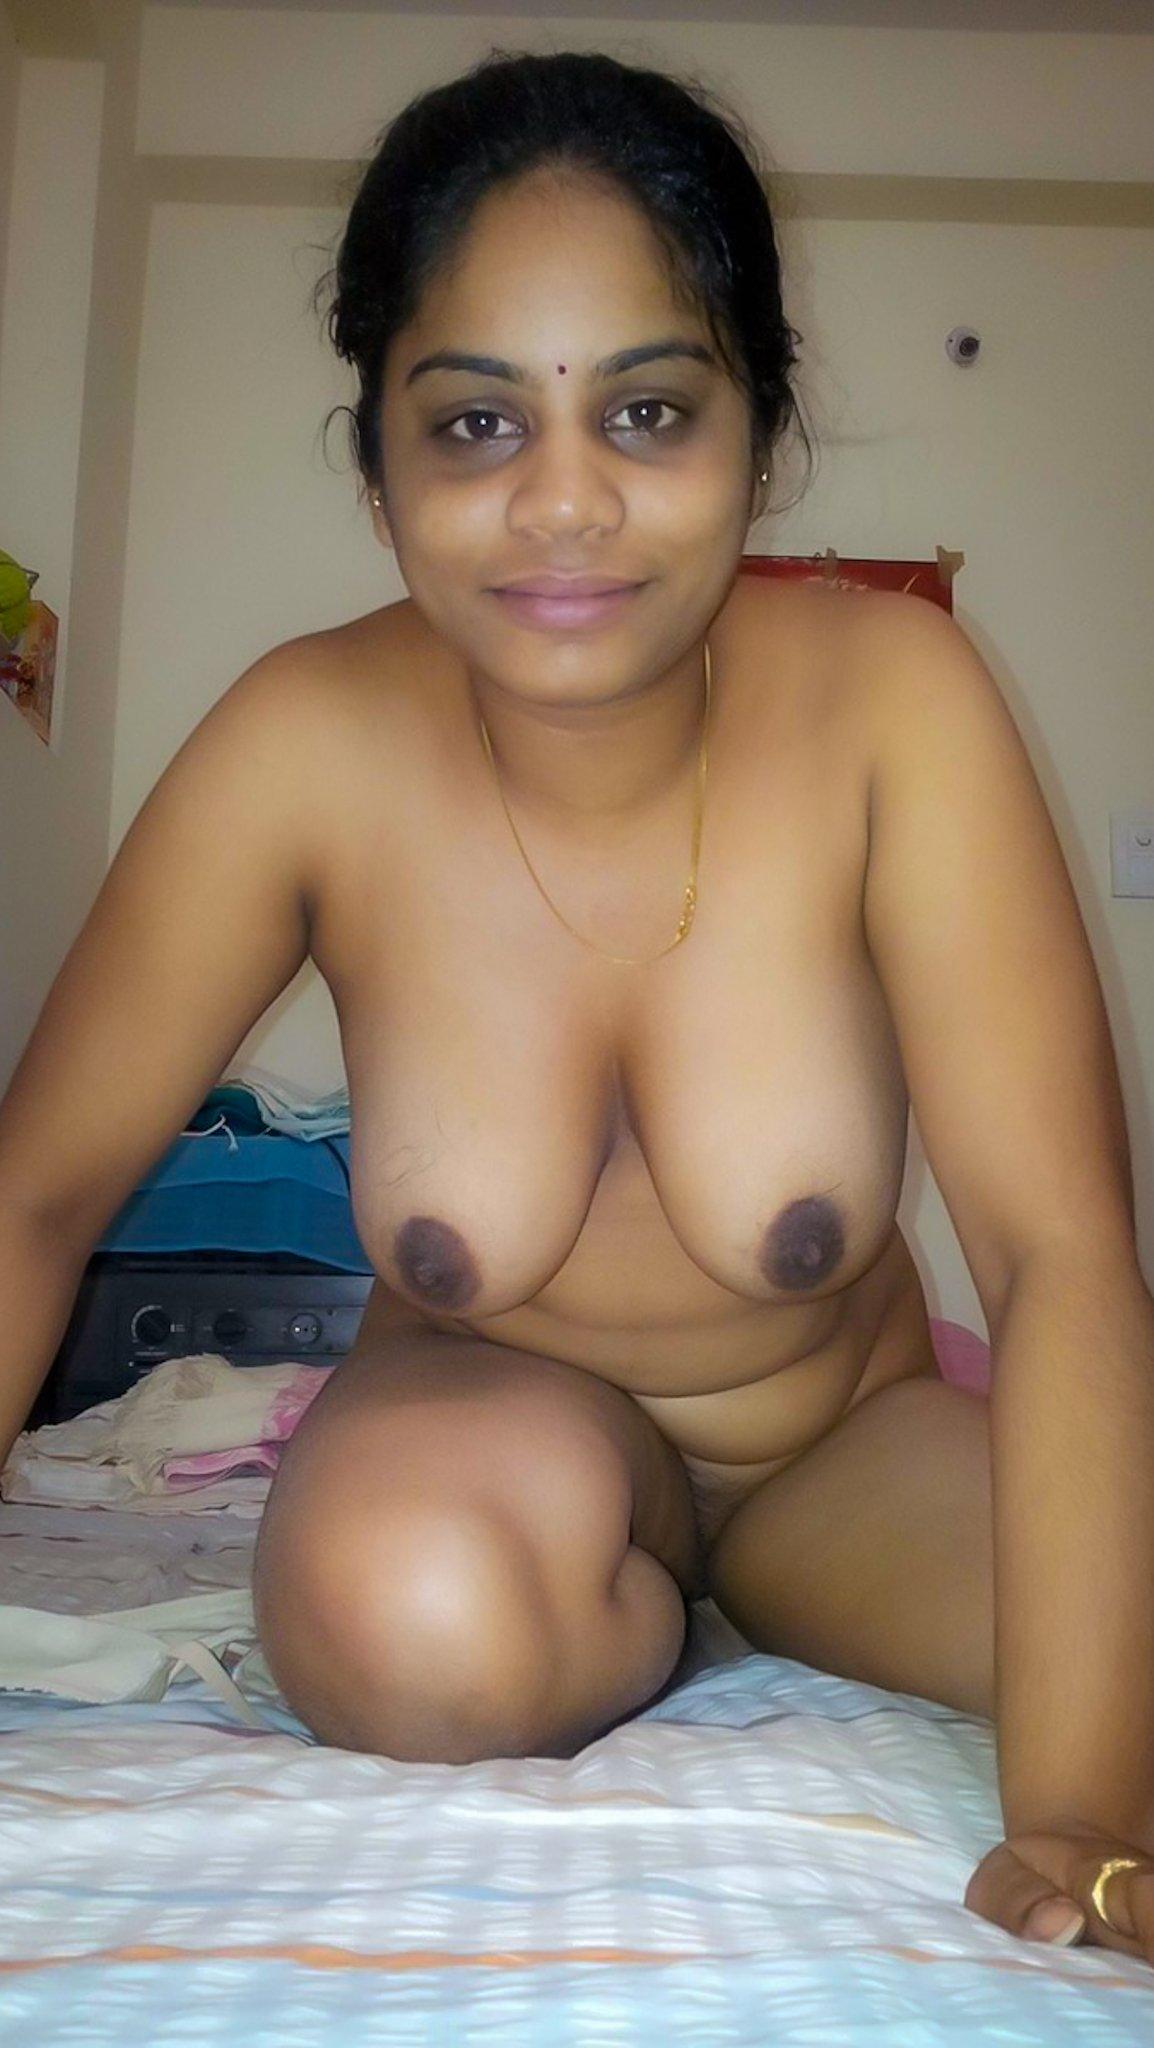 Tamil Nude Girl Photo Mature Pornhub